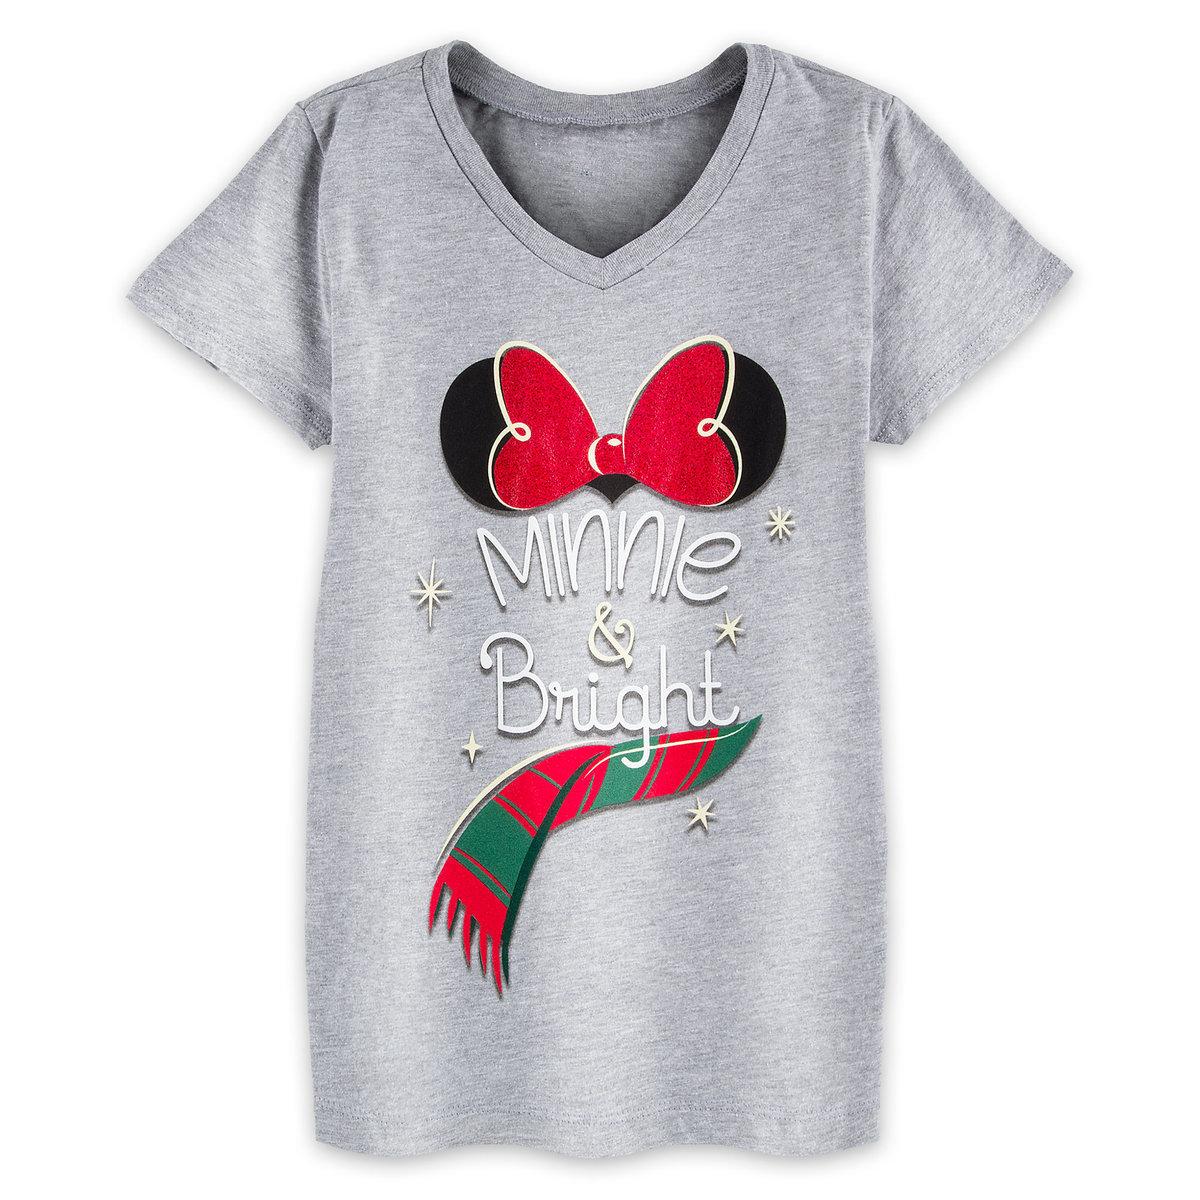 Disney Child Shirt - Minnie and Bright Holiday Tee